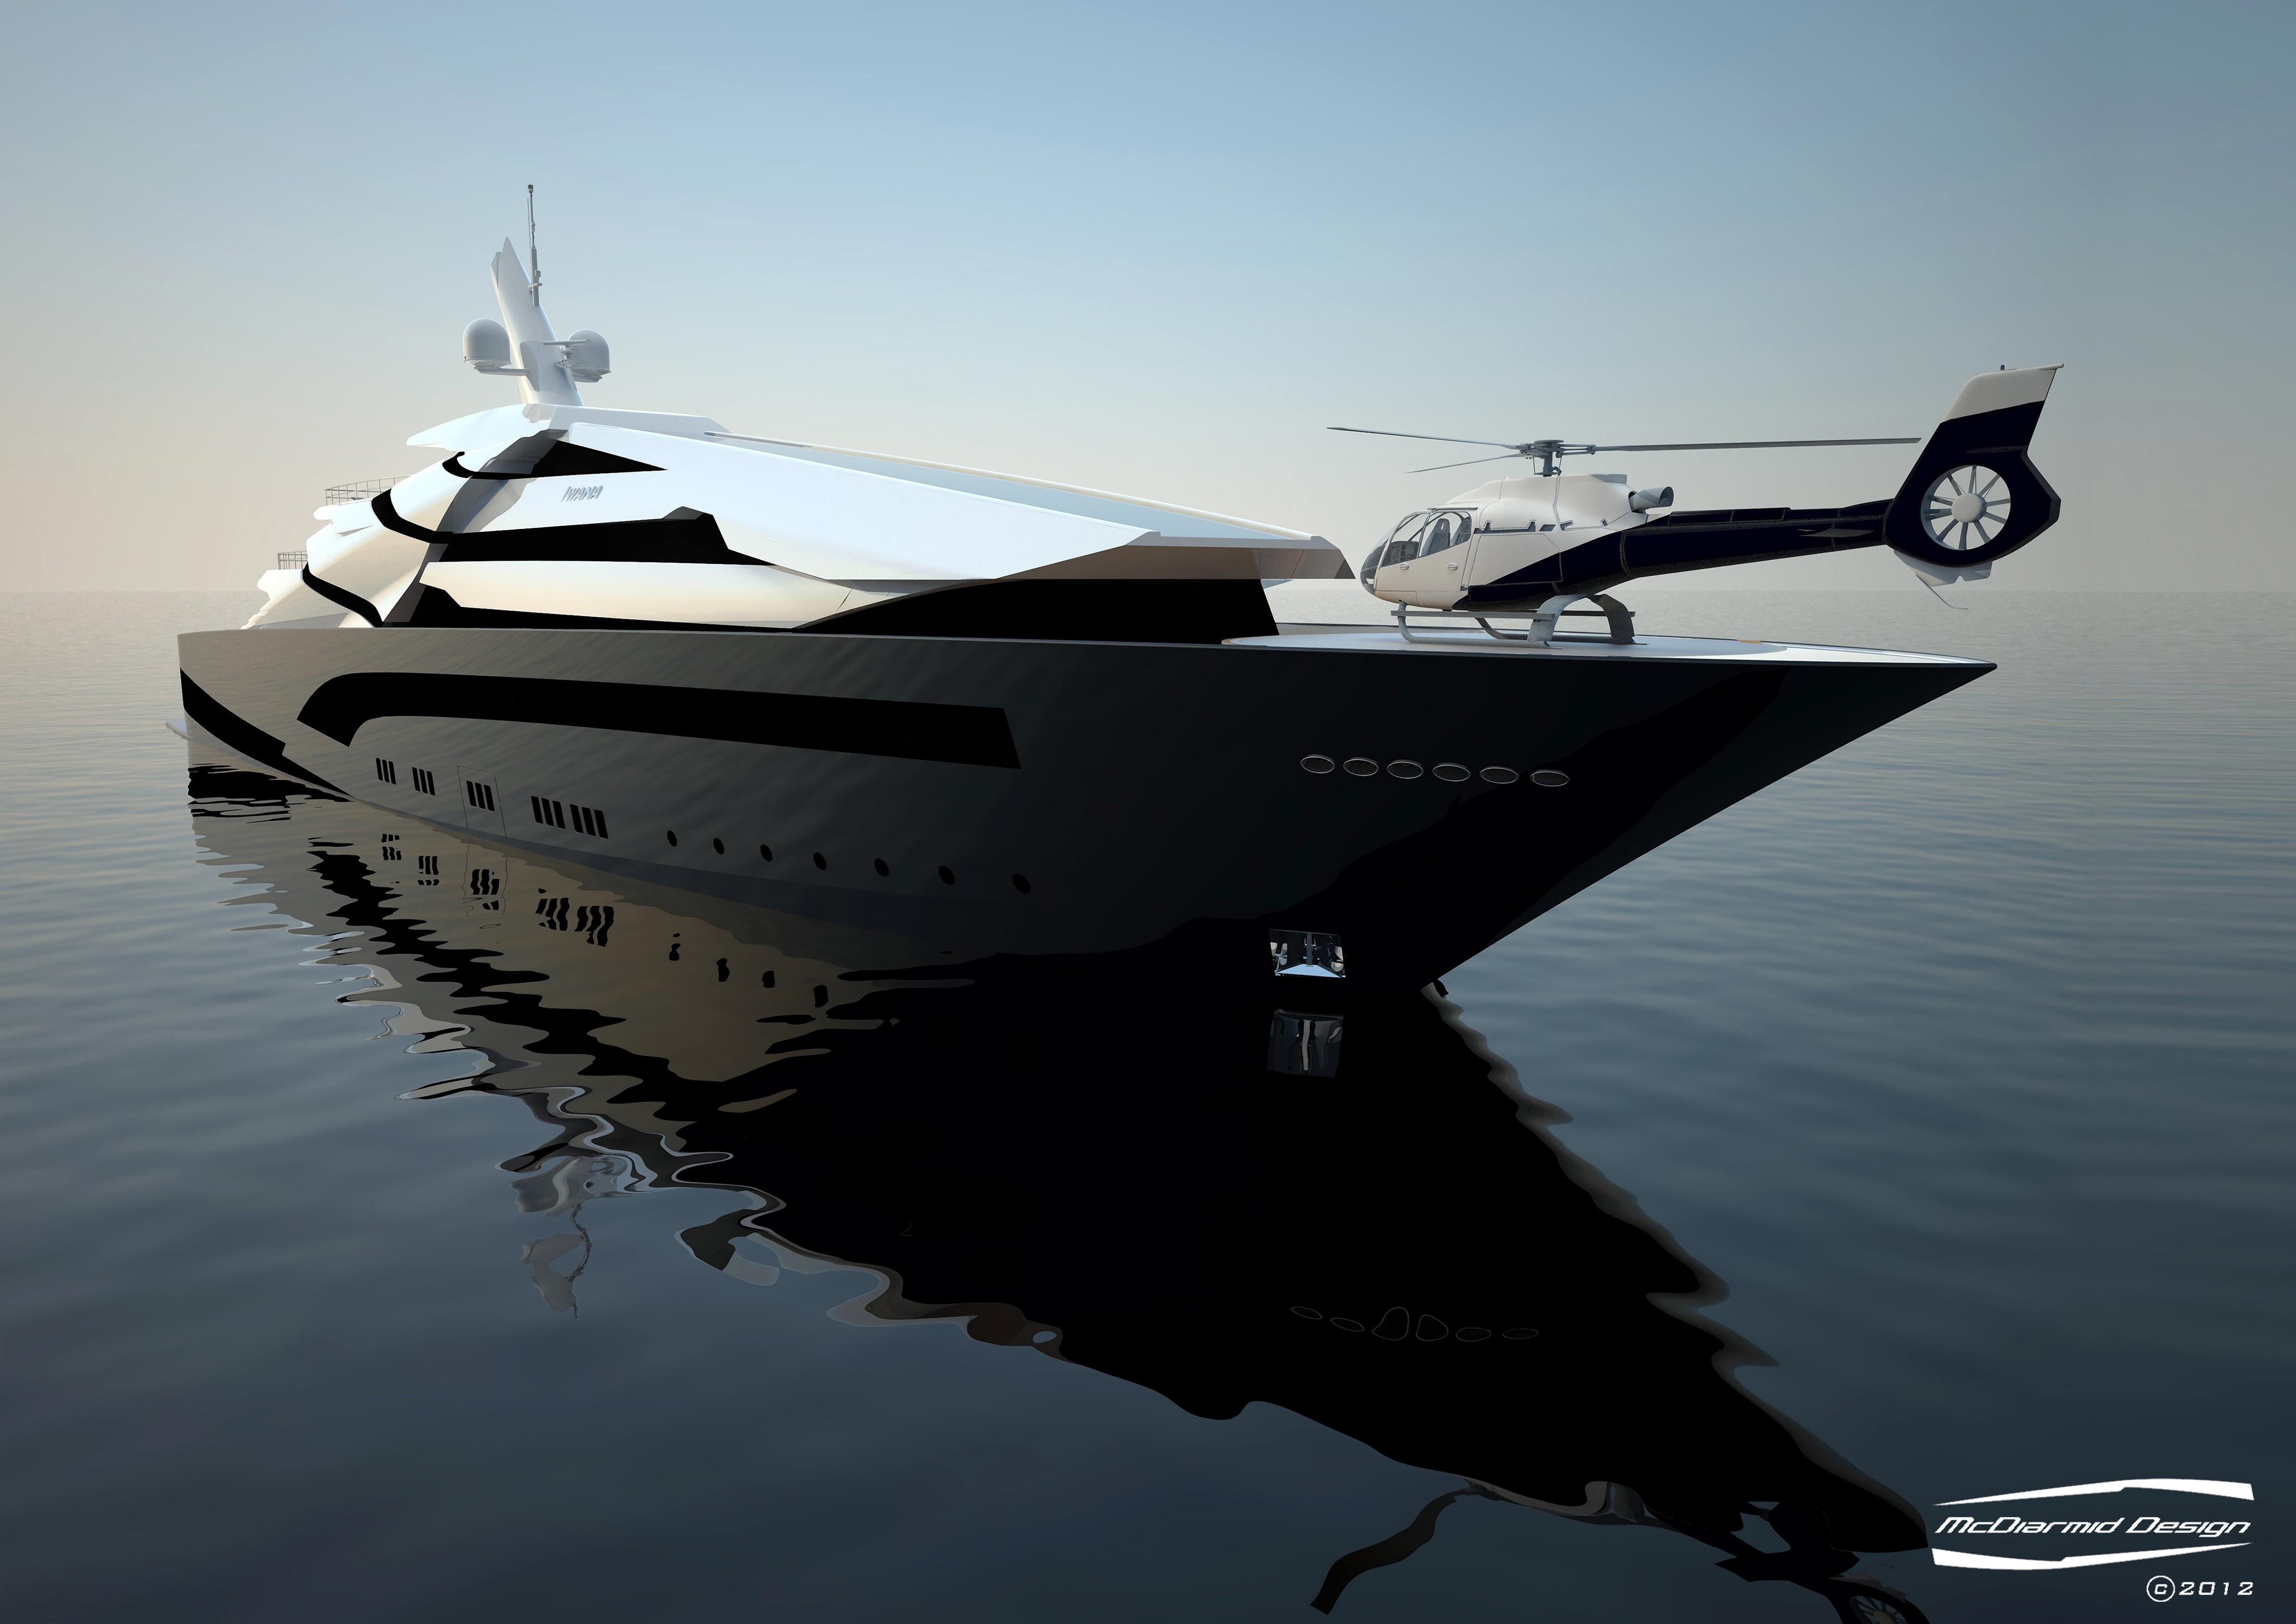 The 87m Super Yacht Iwana By McDiarmid Design